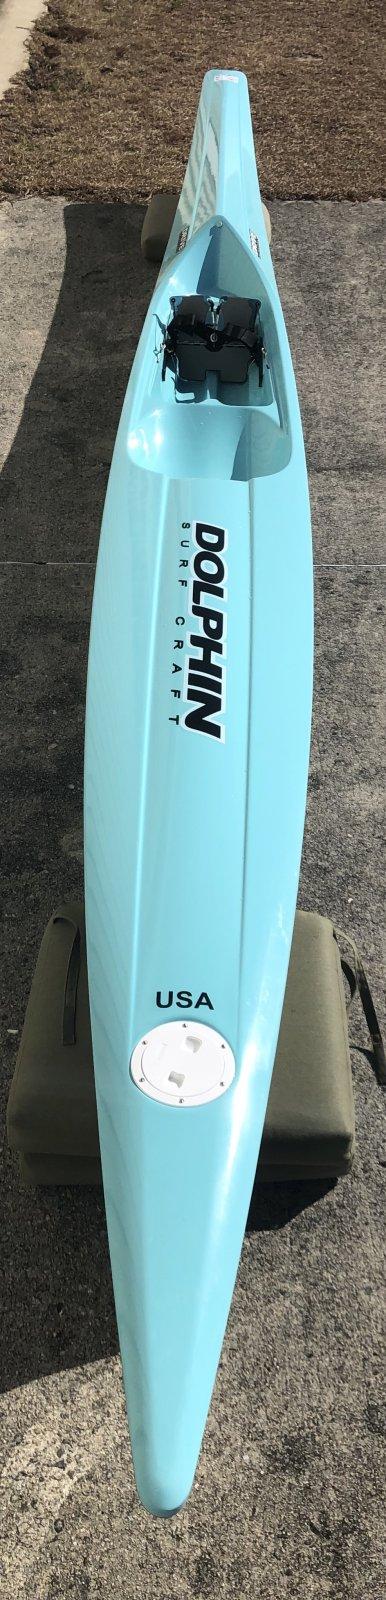 Dolphin Adjustable Drive II Surf Ski 19' - Demo 1039